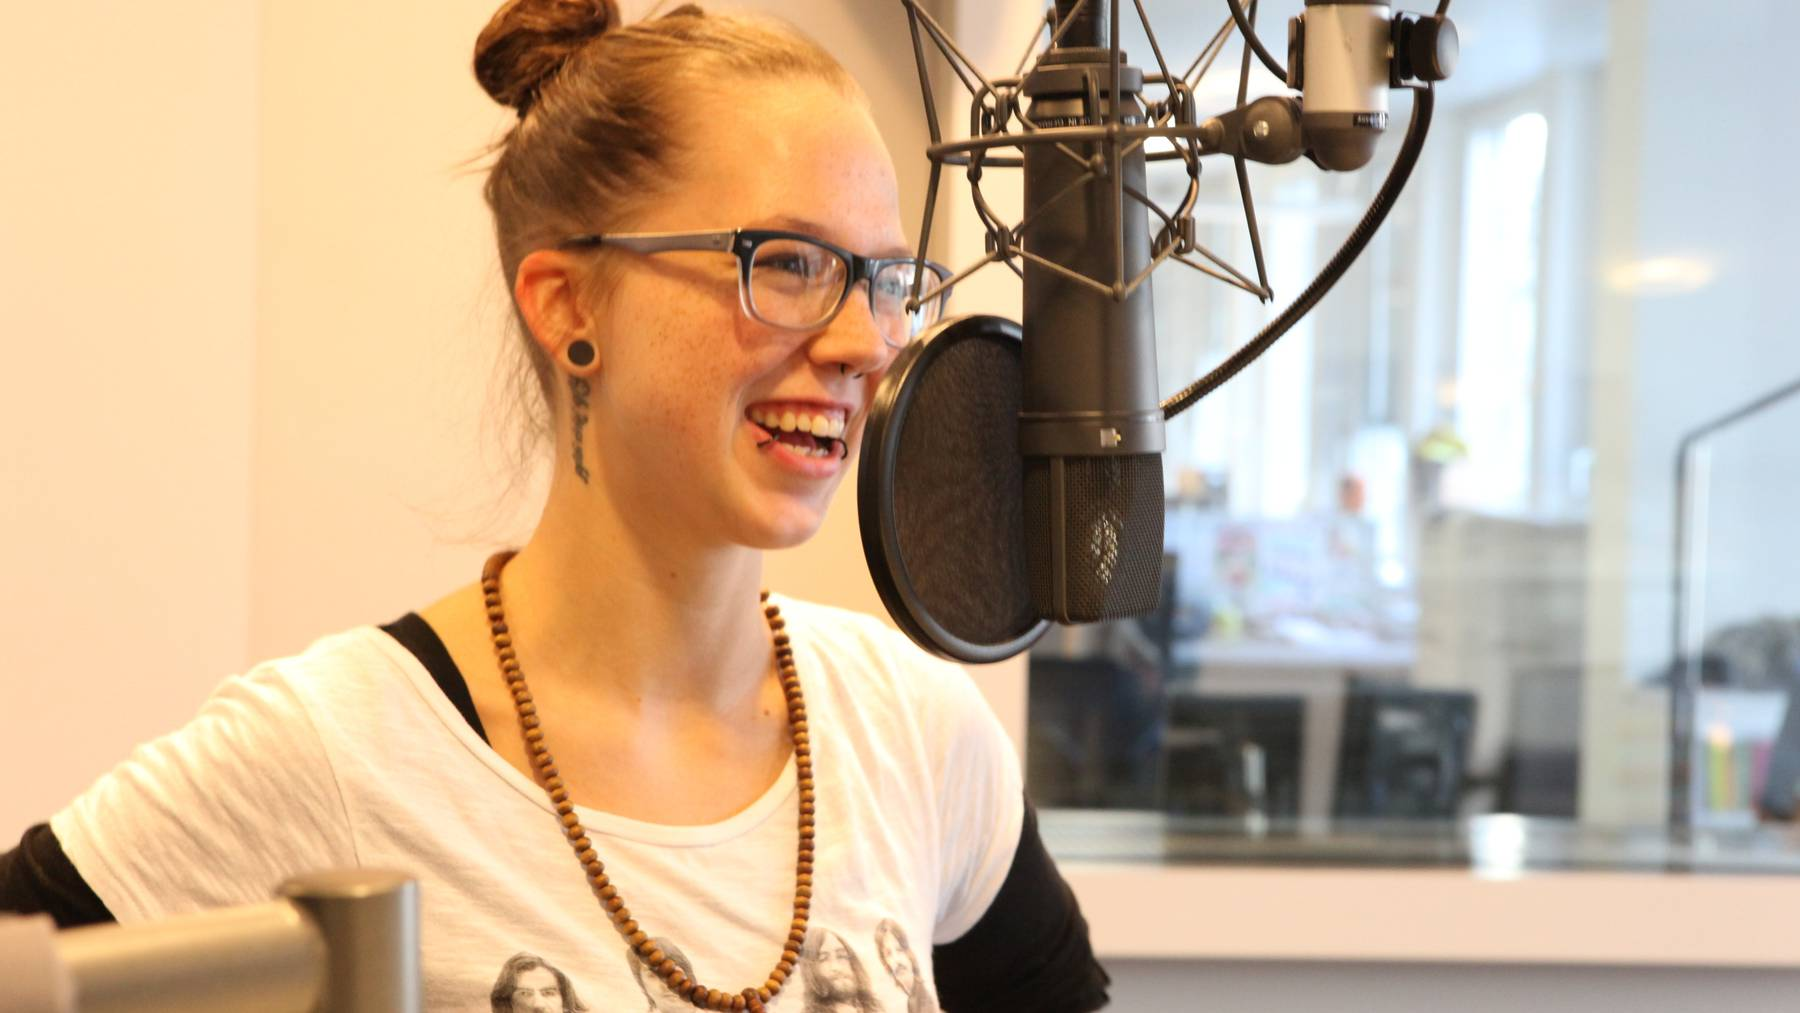 Stefanie Heinzmanns Lieblingssong